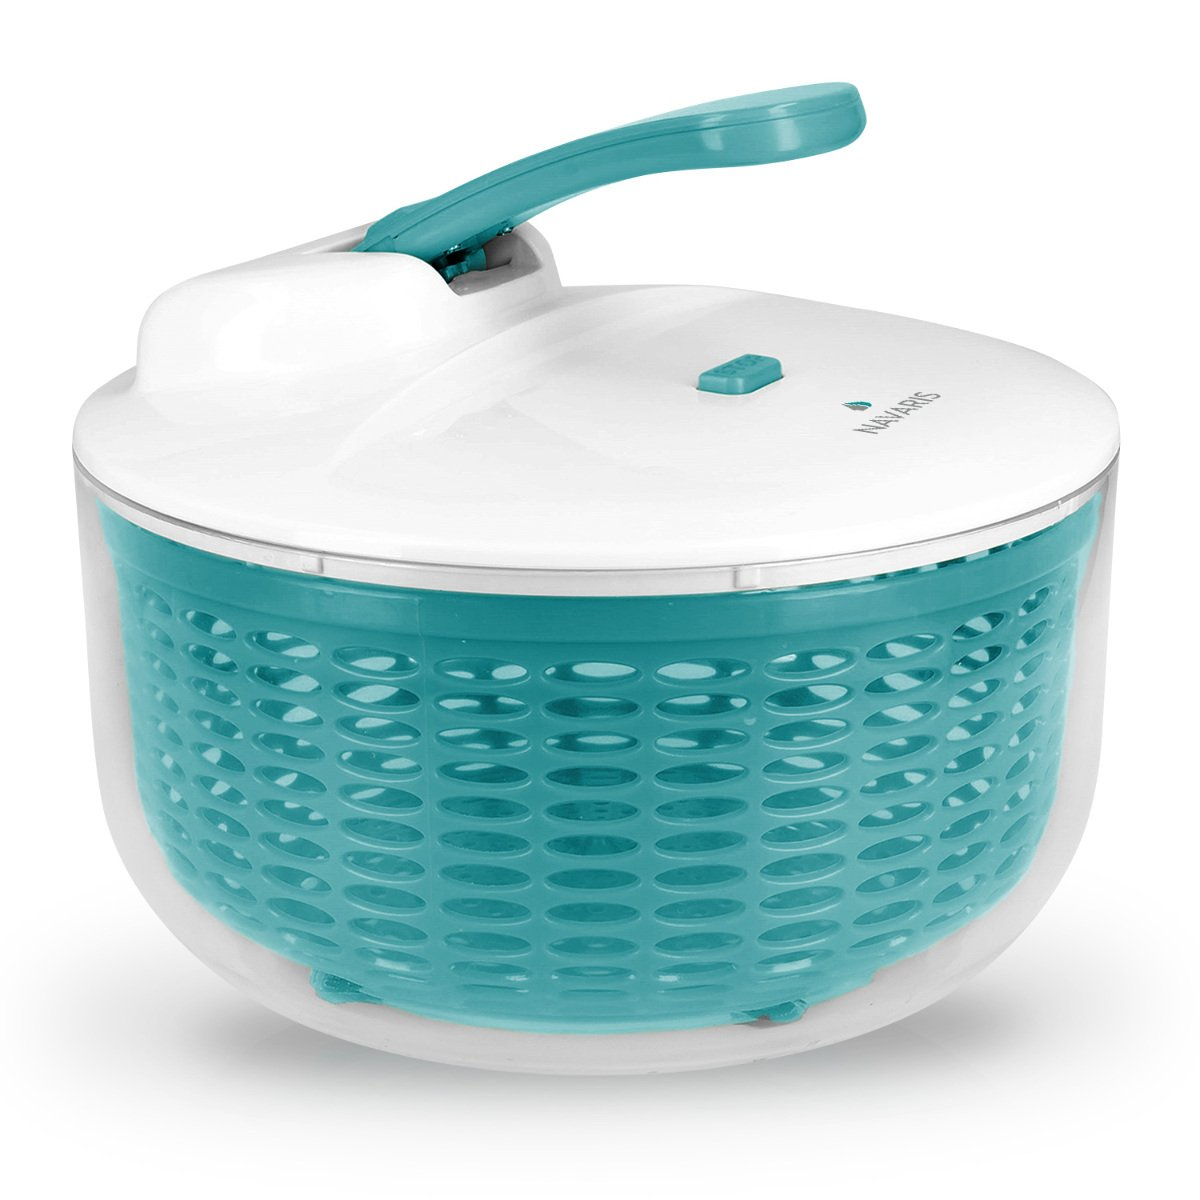 Navaris 2in1 Salad spinner bowl with lid - Big salad bowl sieve for salad pasta - Ø 26cm spinner with 5 liter capacity KW-Commerce 43636_m000628